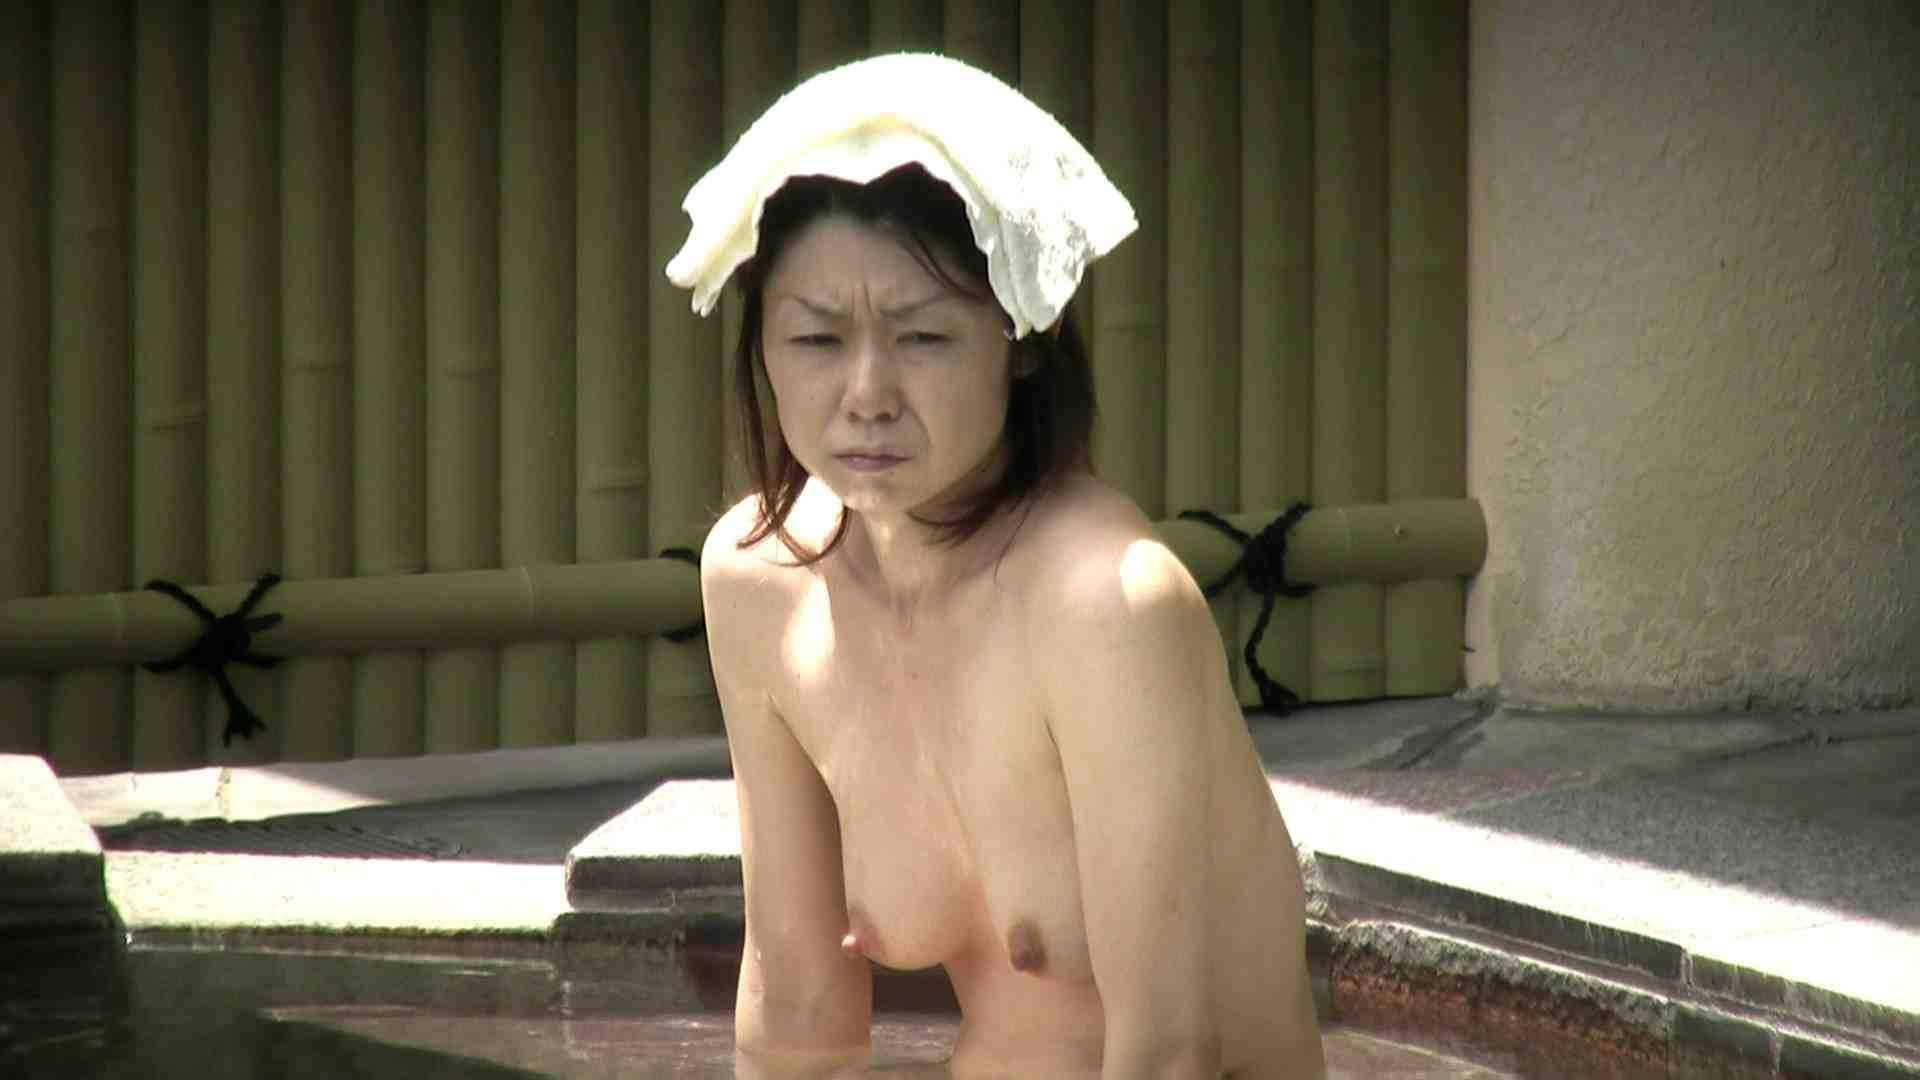 Aquaな露天風呂Vol.658 OLのエロ生活 | 露天風呂  30連発 16